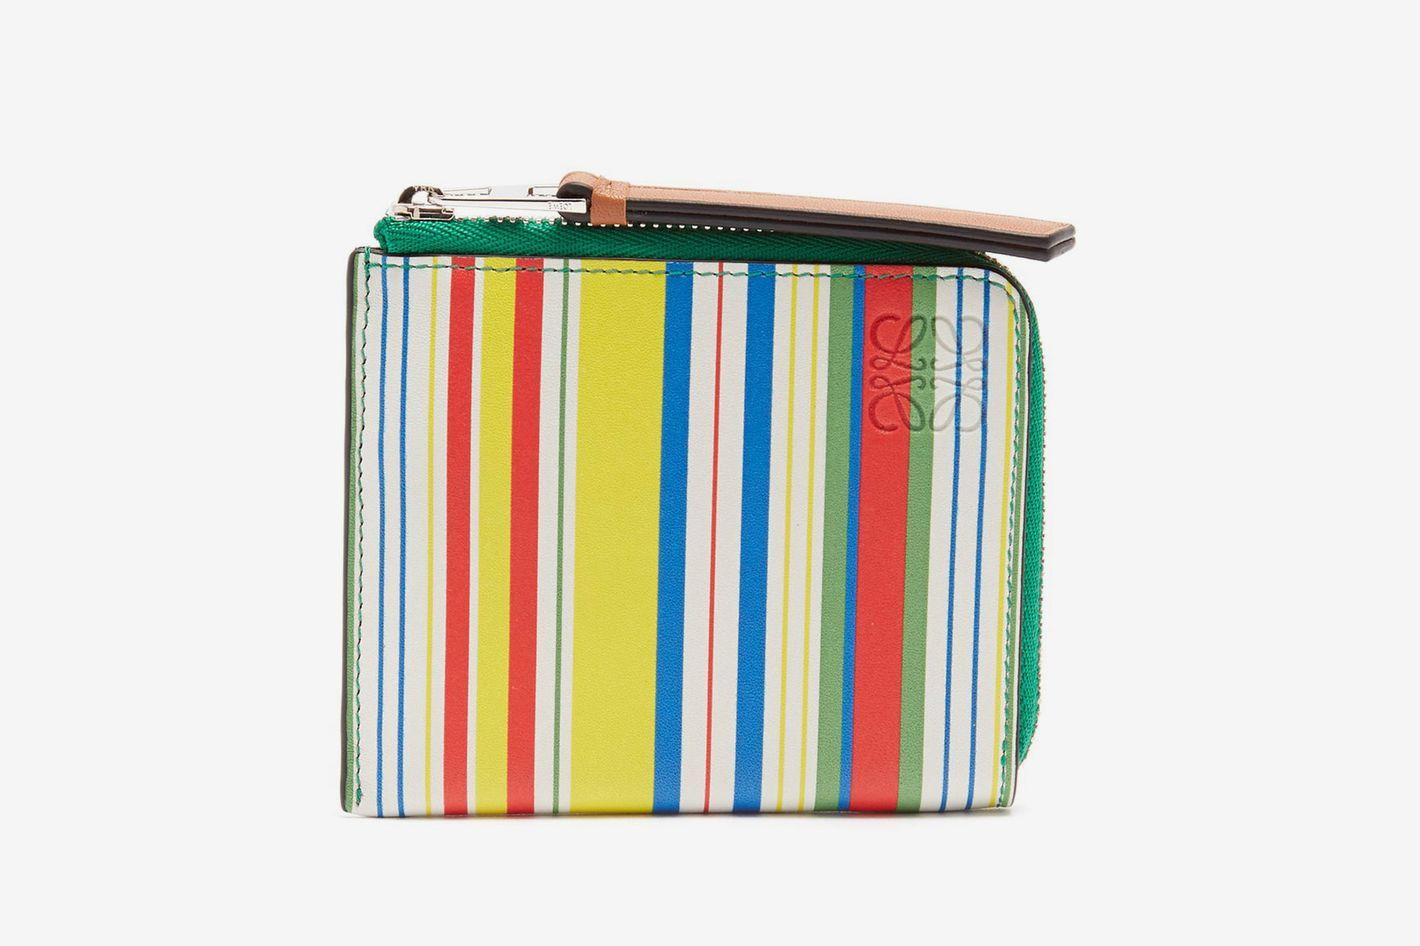 Loewe Multicoloured Zip-Around Leather Wallet